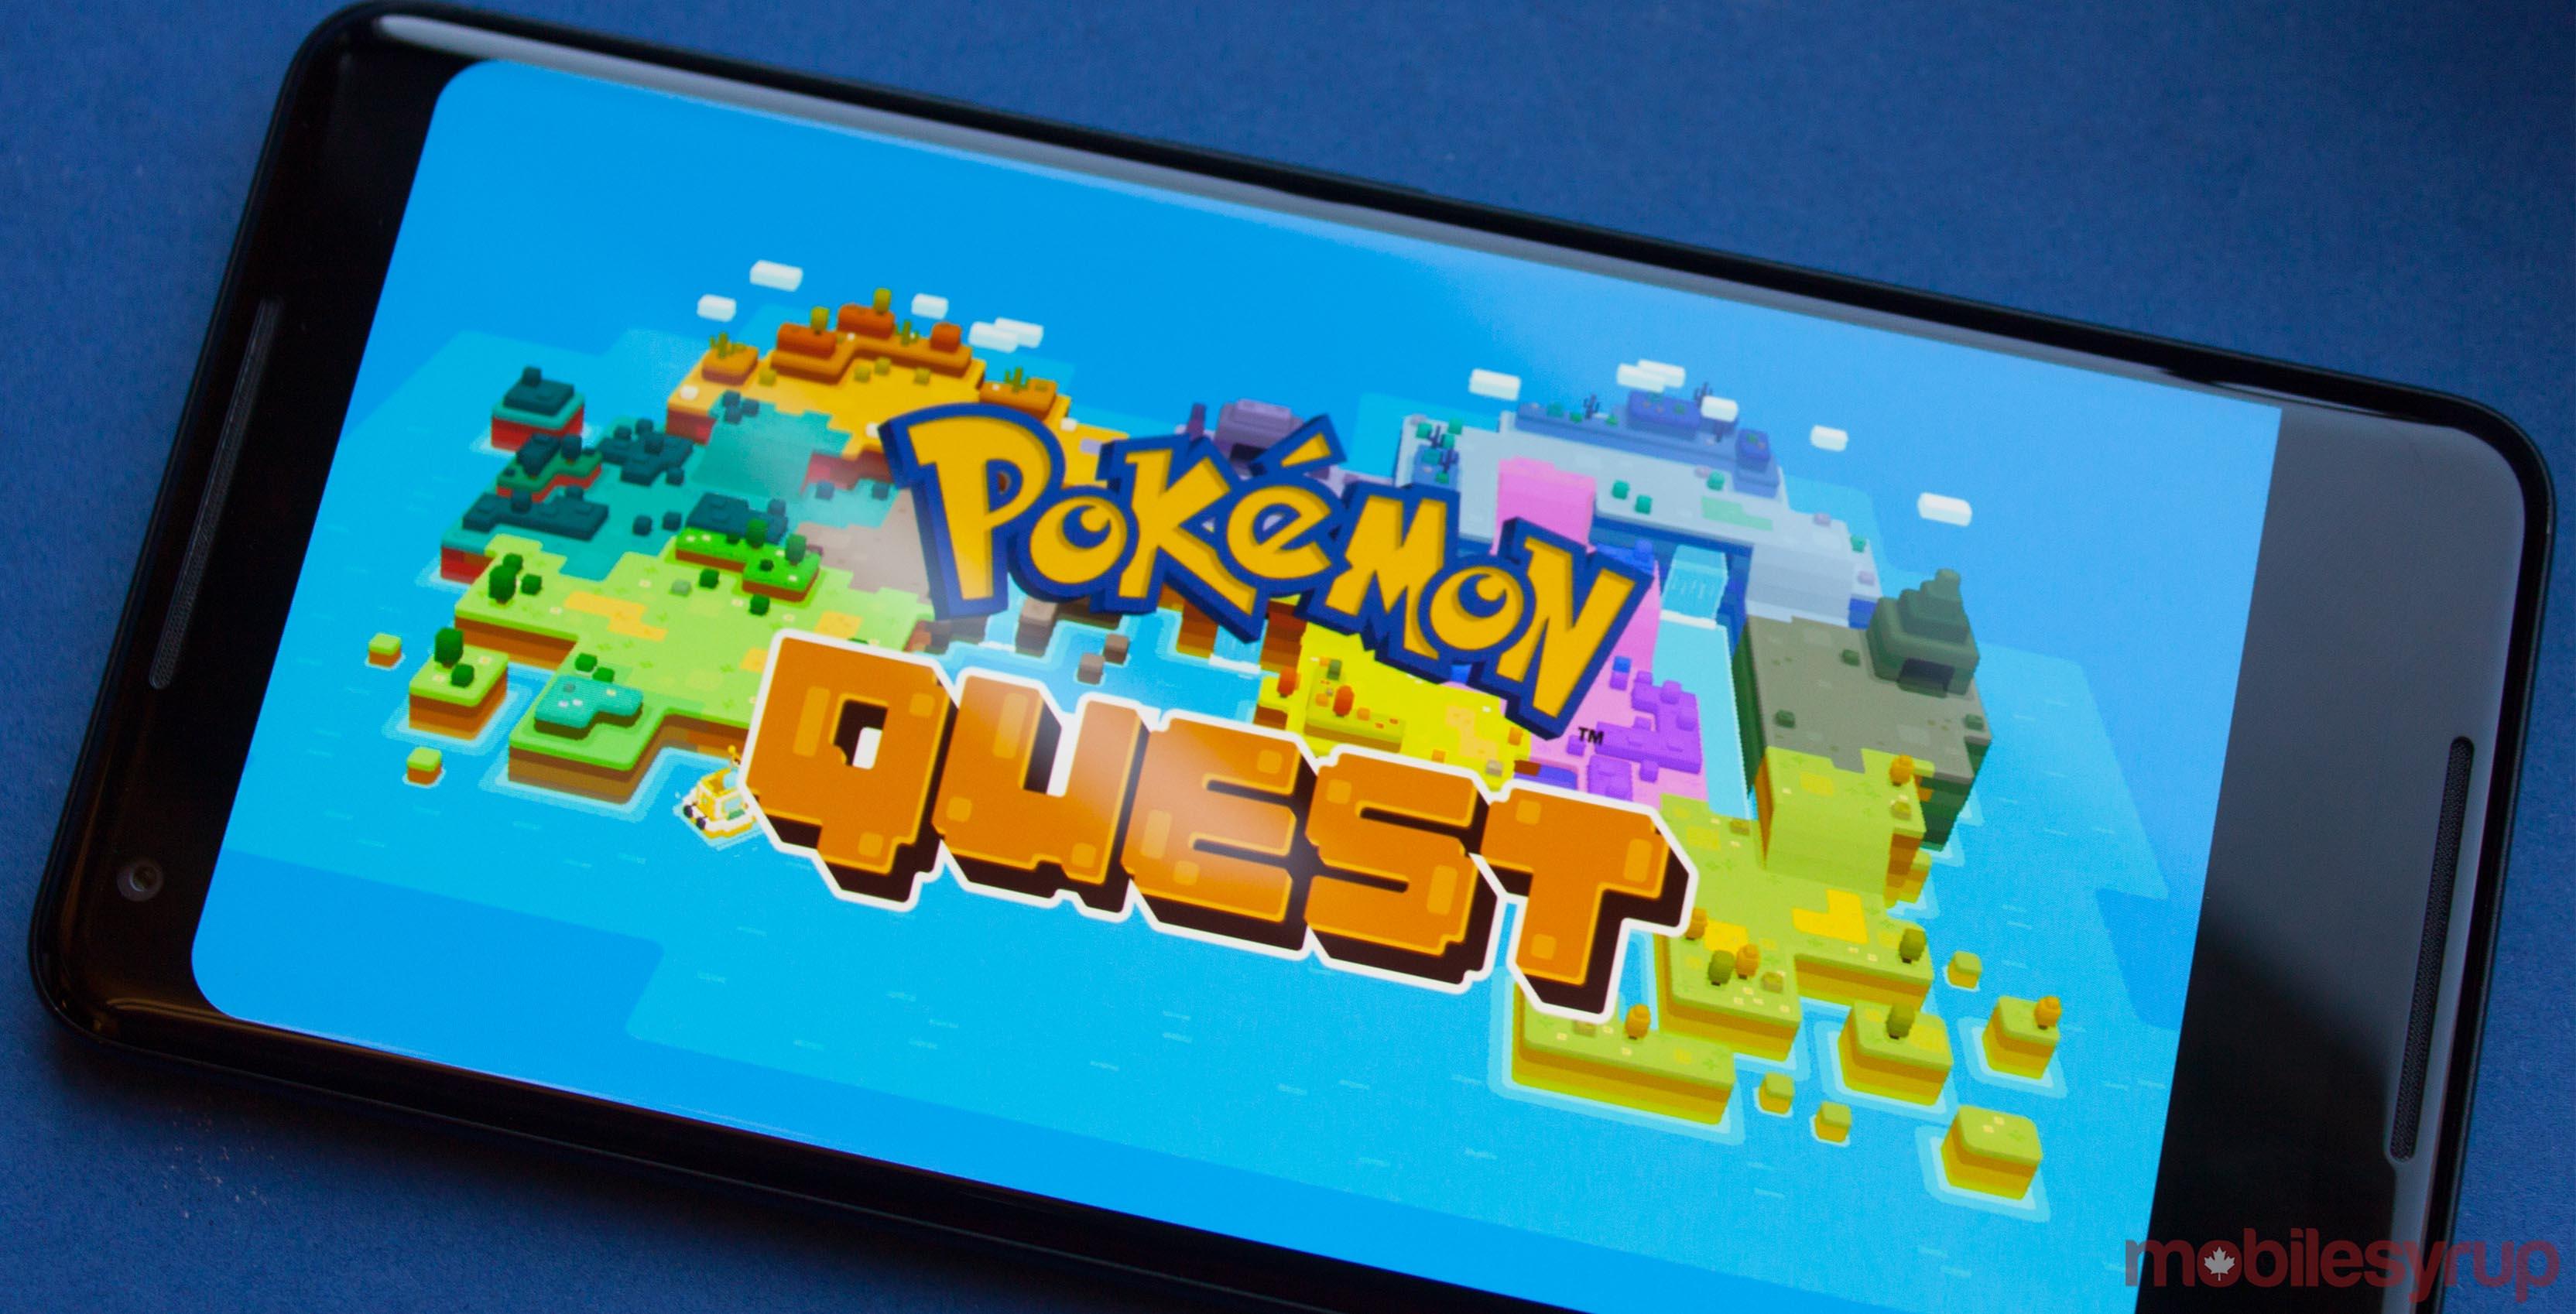 Pokemon Quest title screen